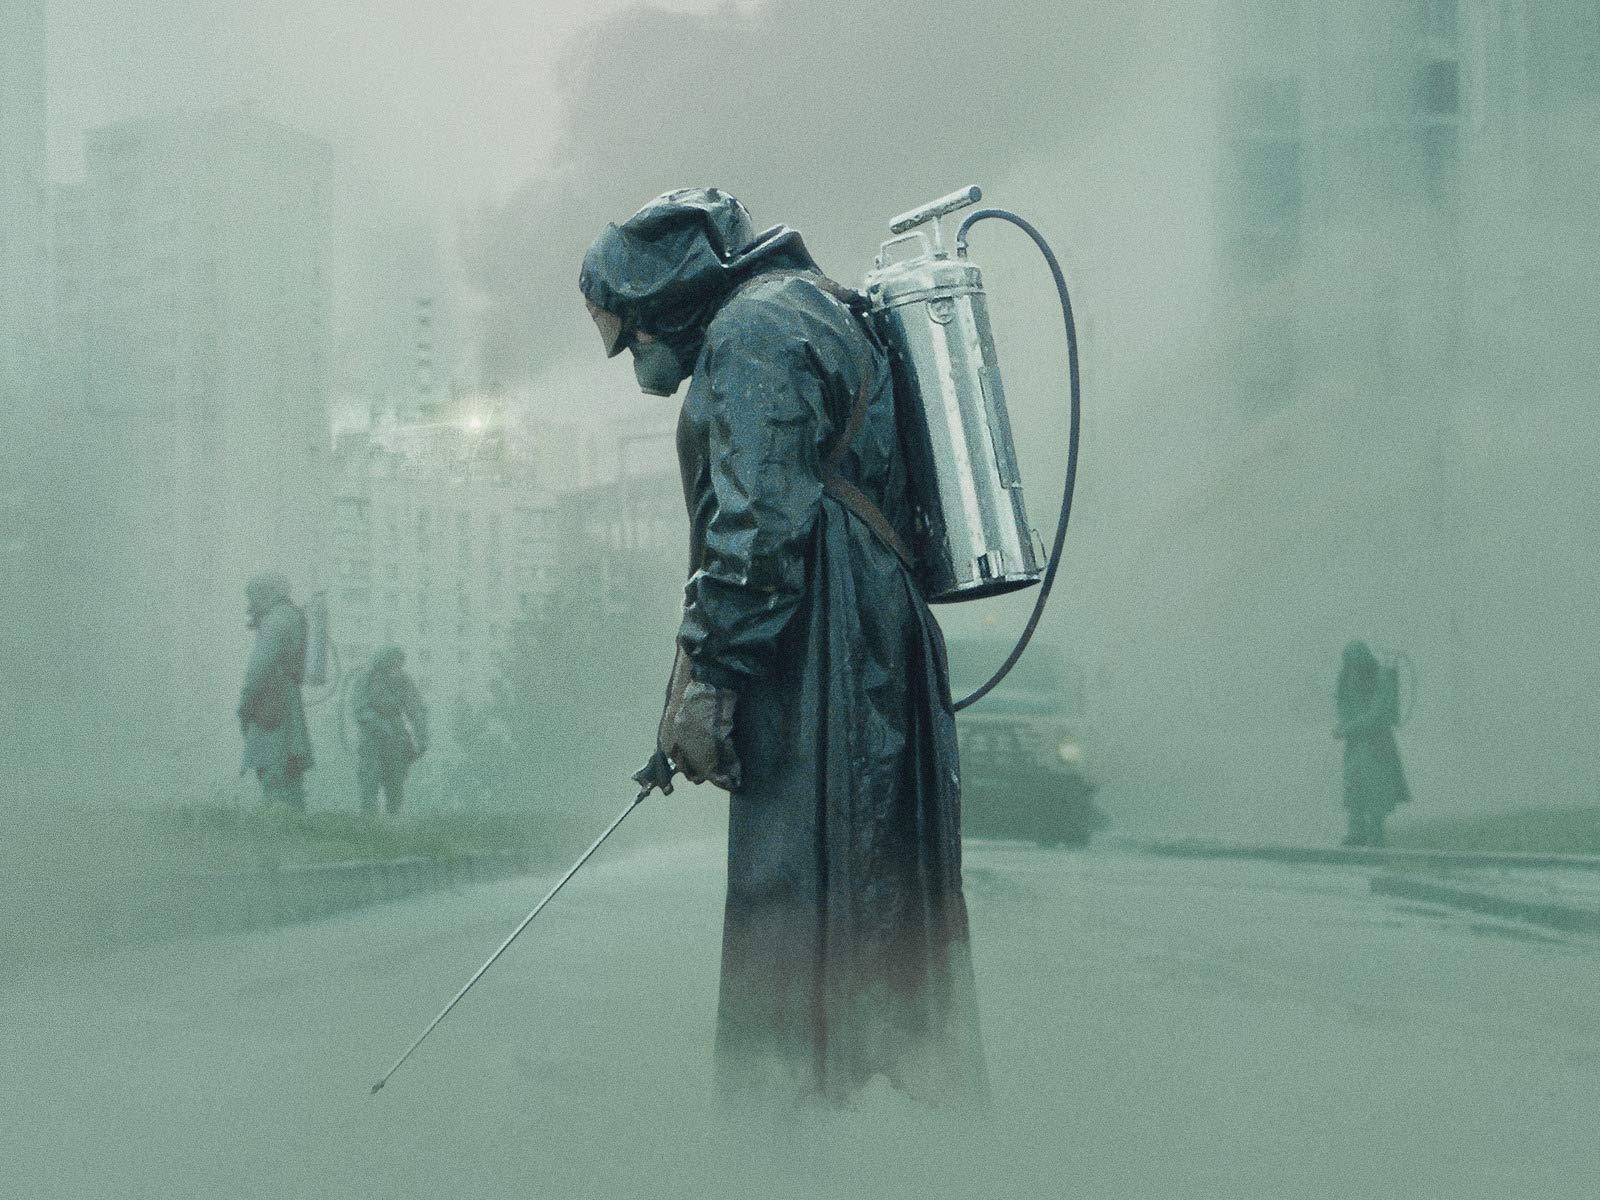 Amazon com: Chernobyl - Season 1: Jared Harris, Stellan Skarsgard